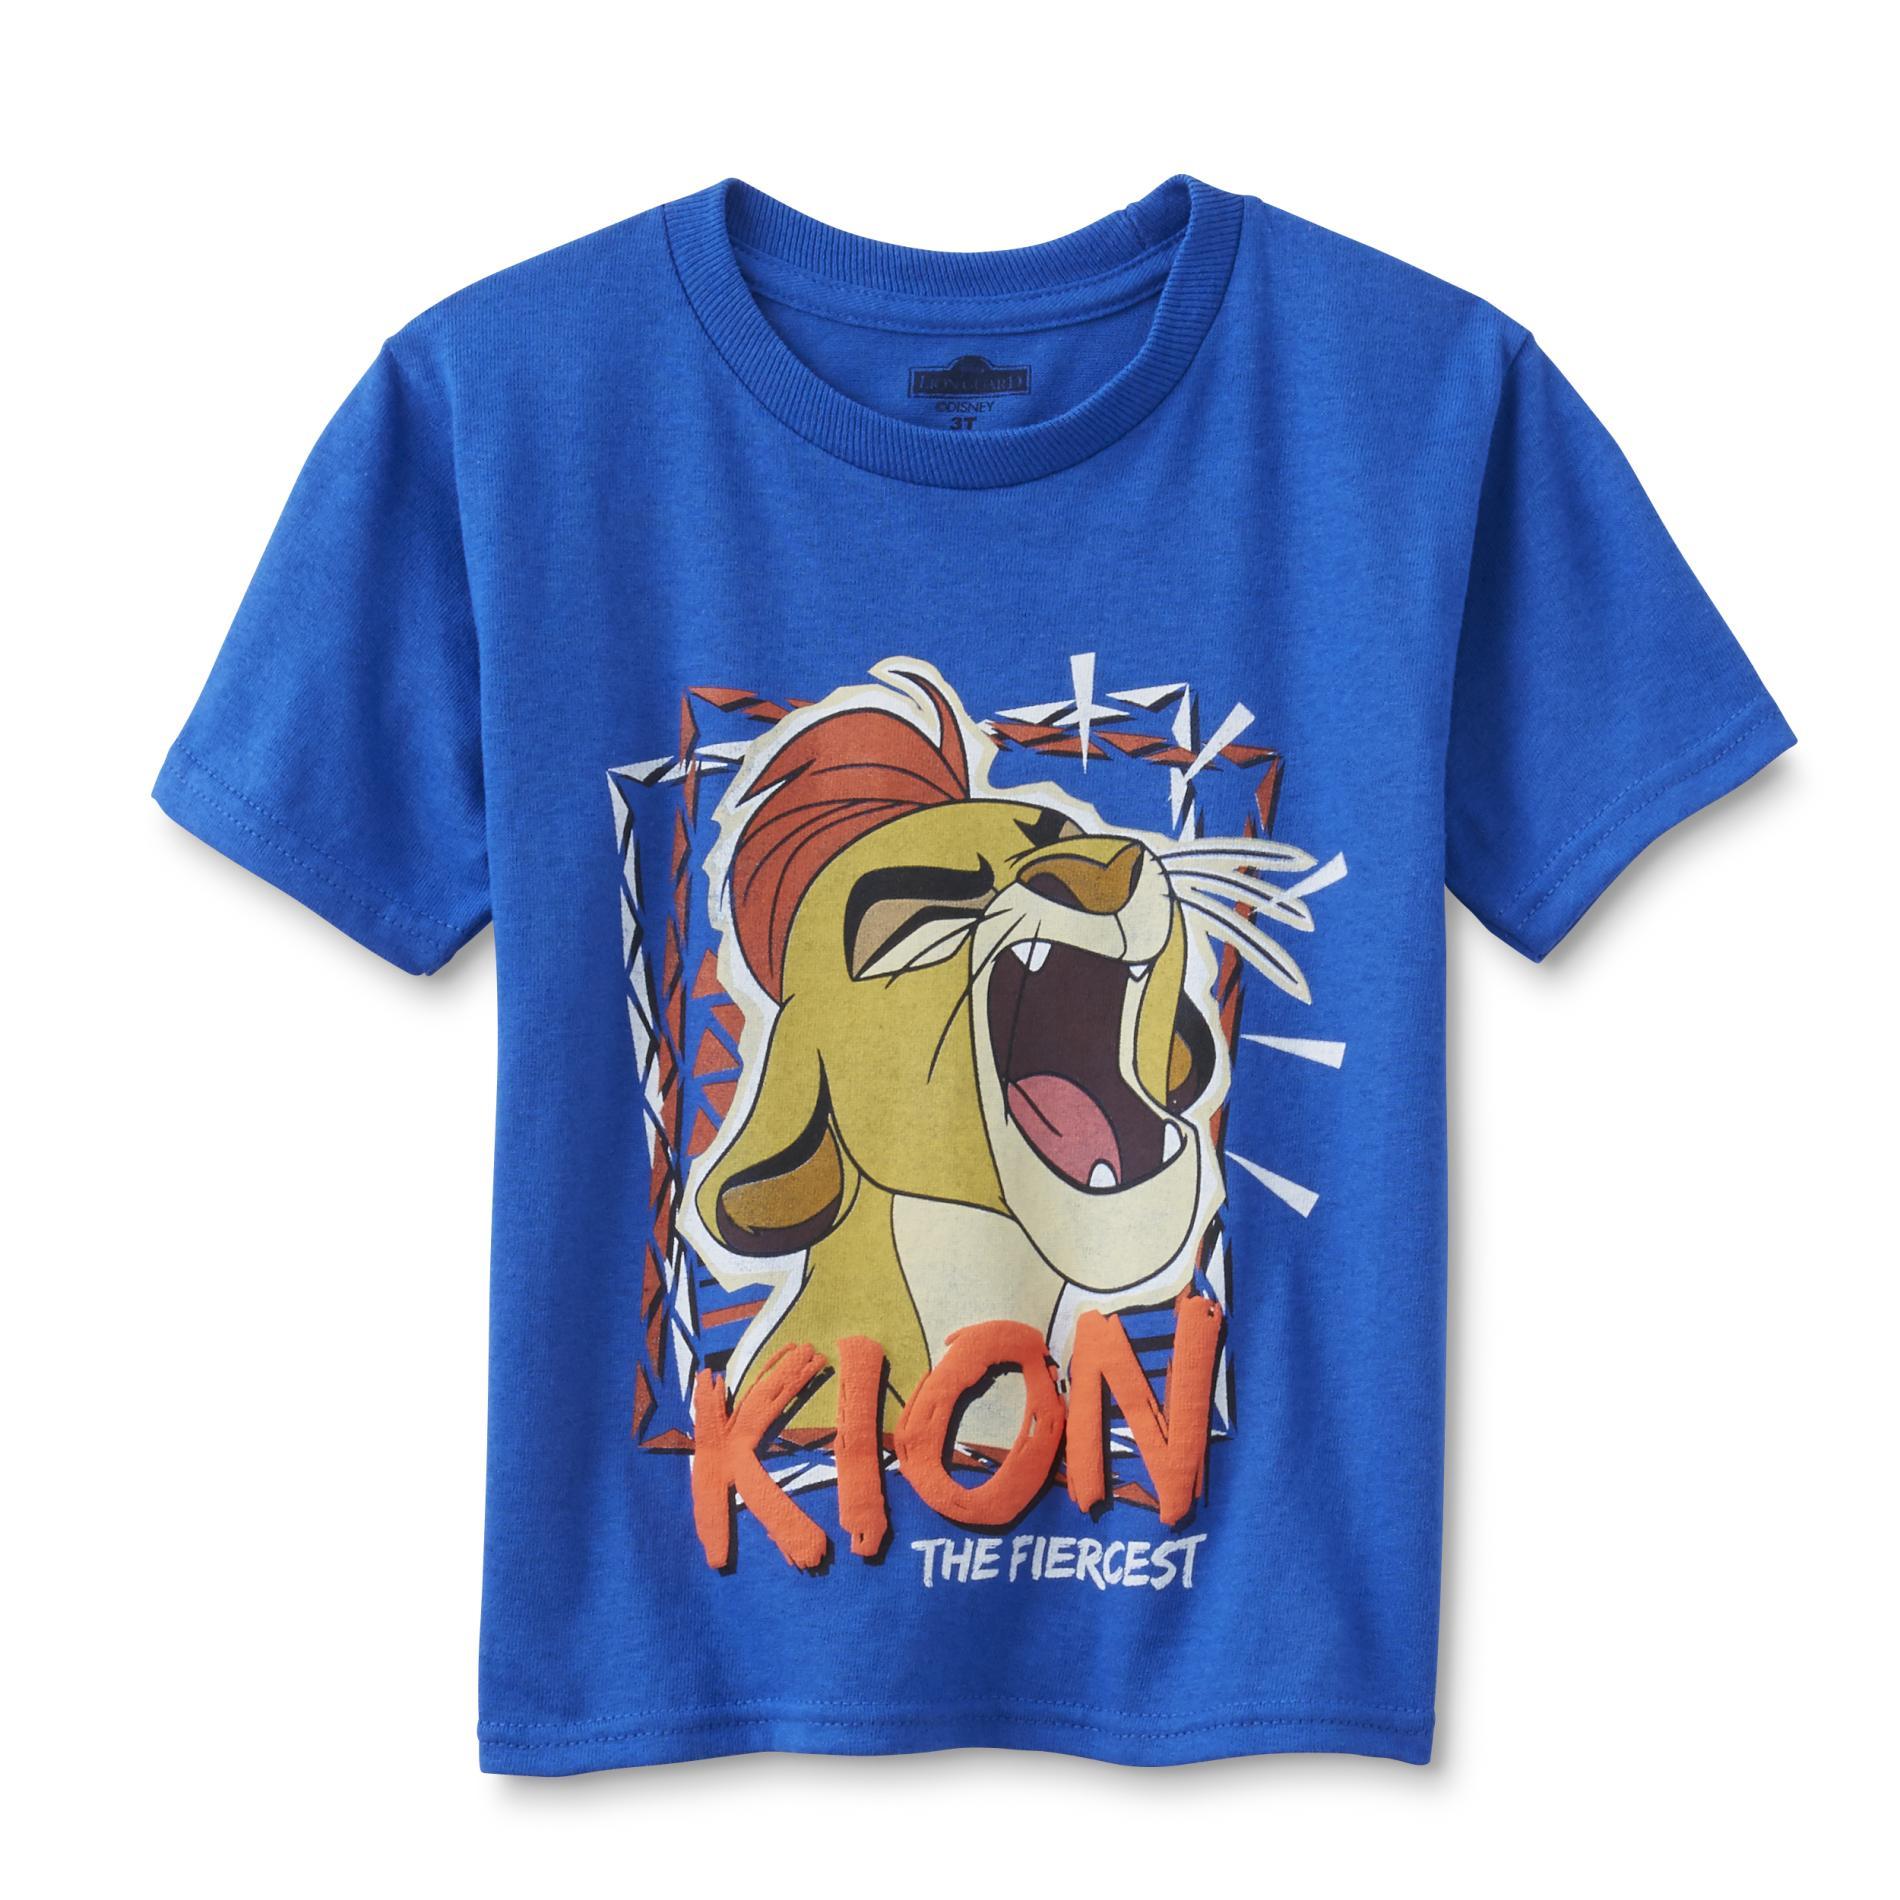 Disney The Lion Guard Toddler Boys' Graphic T-Shirt - Kion